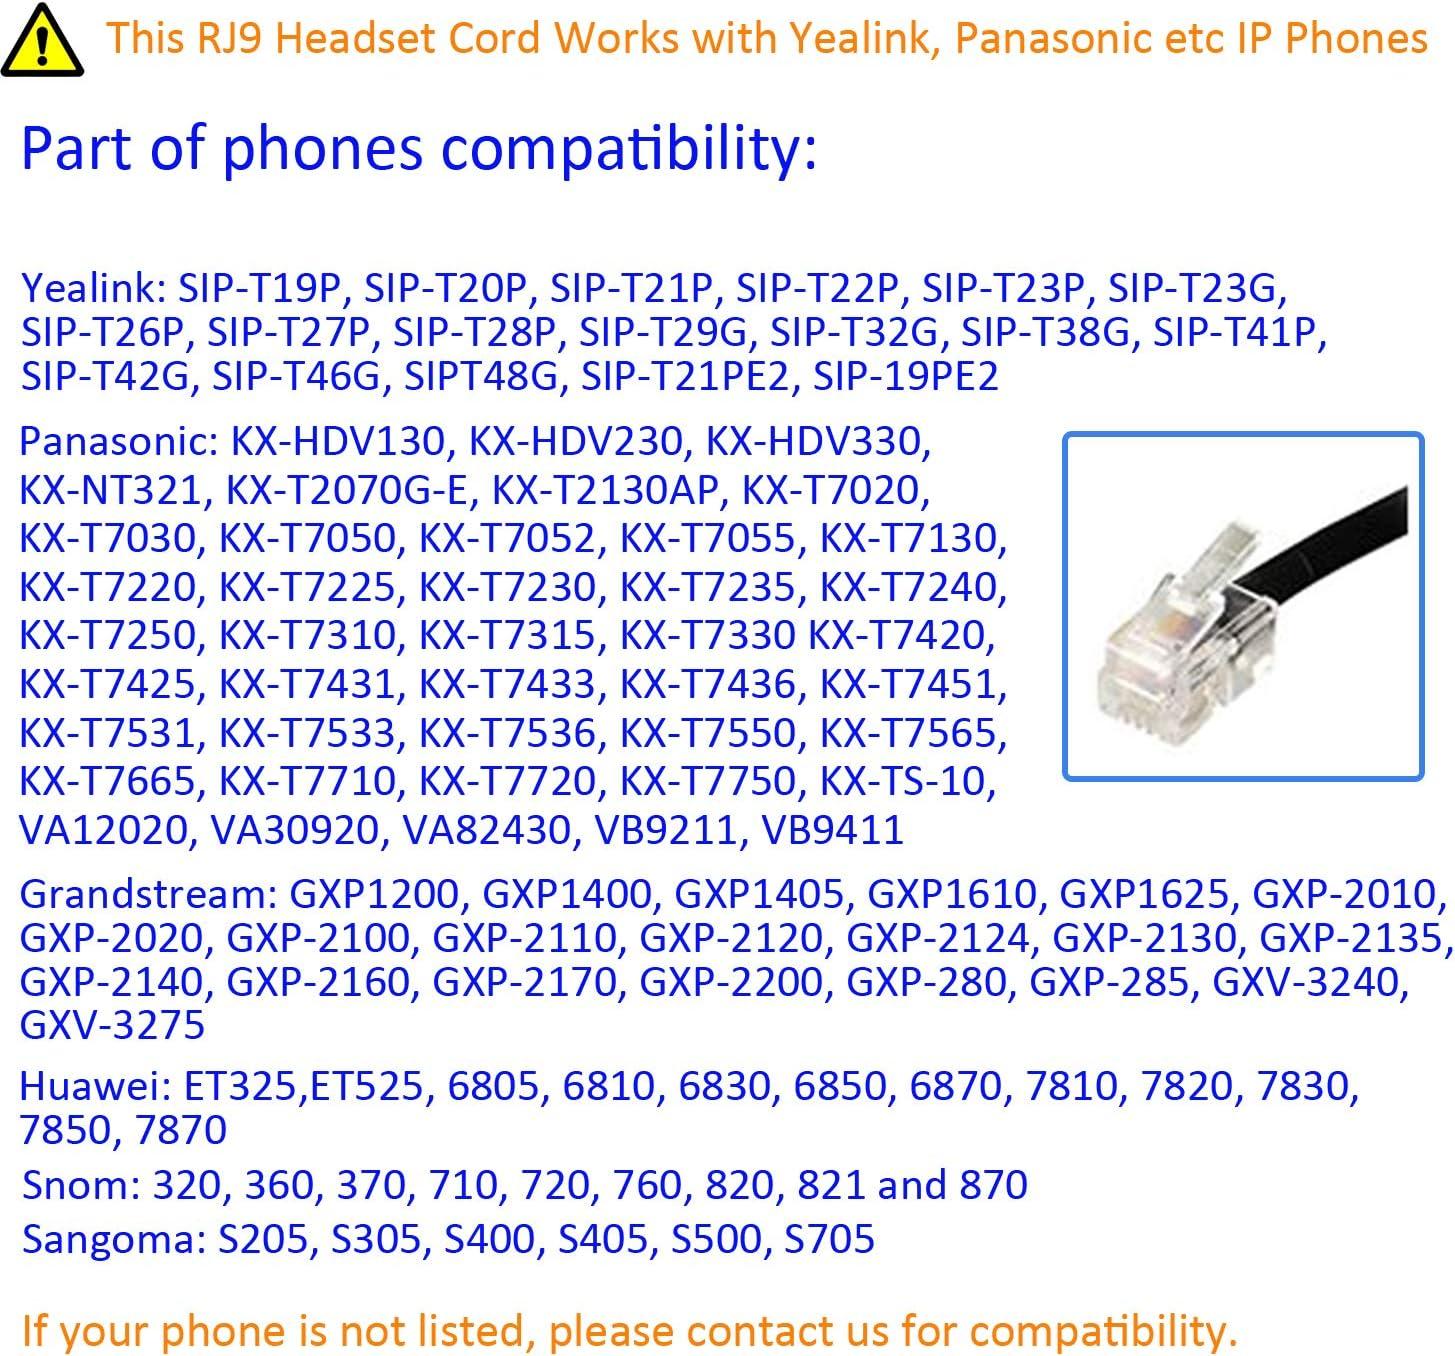 Plantronics U10P-S Coiled Cable for Yealink SNOM Huawei Avaya Panasonic /& Cisco